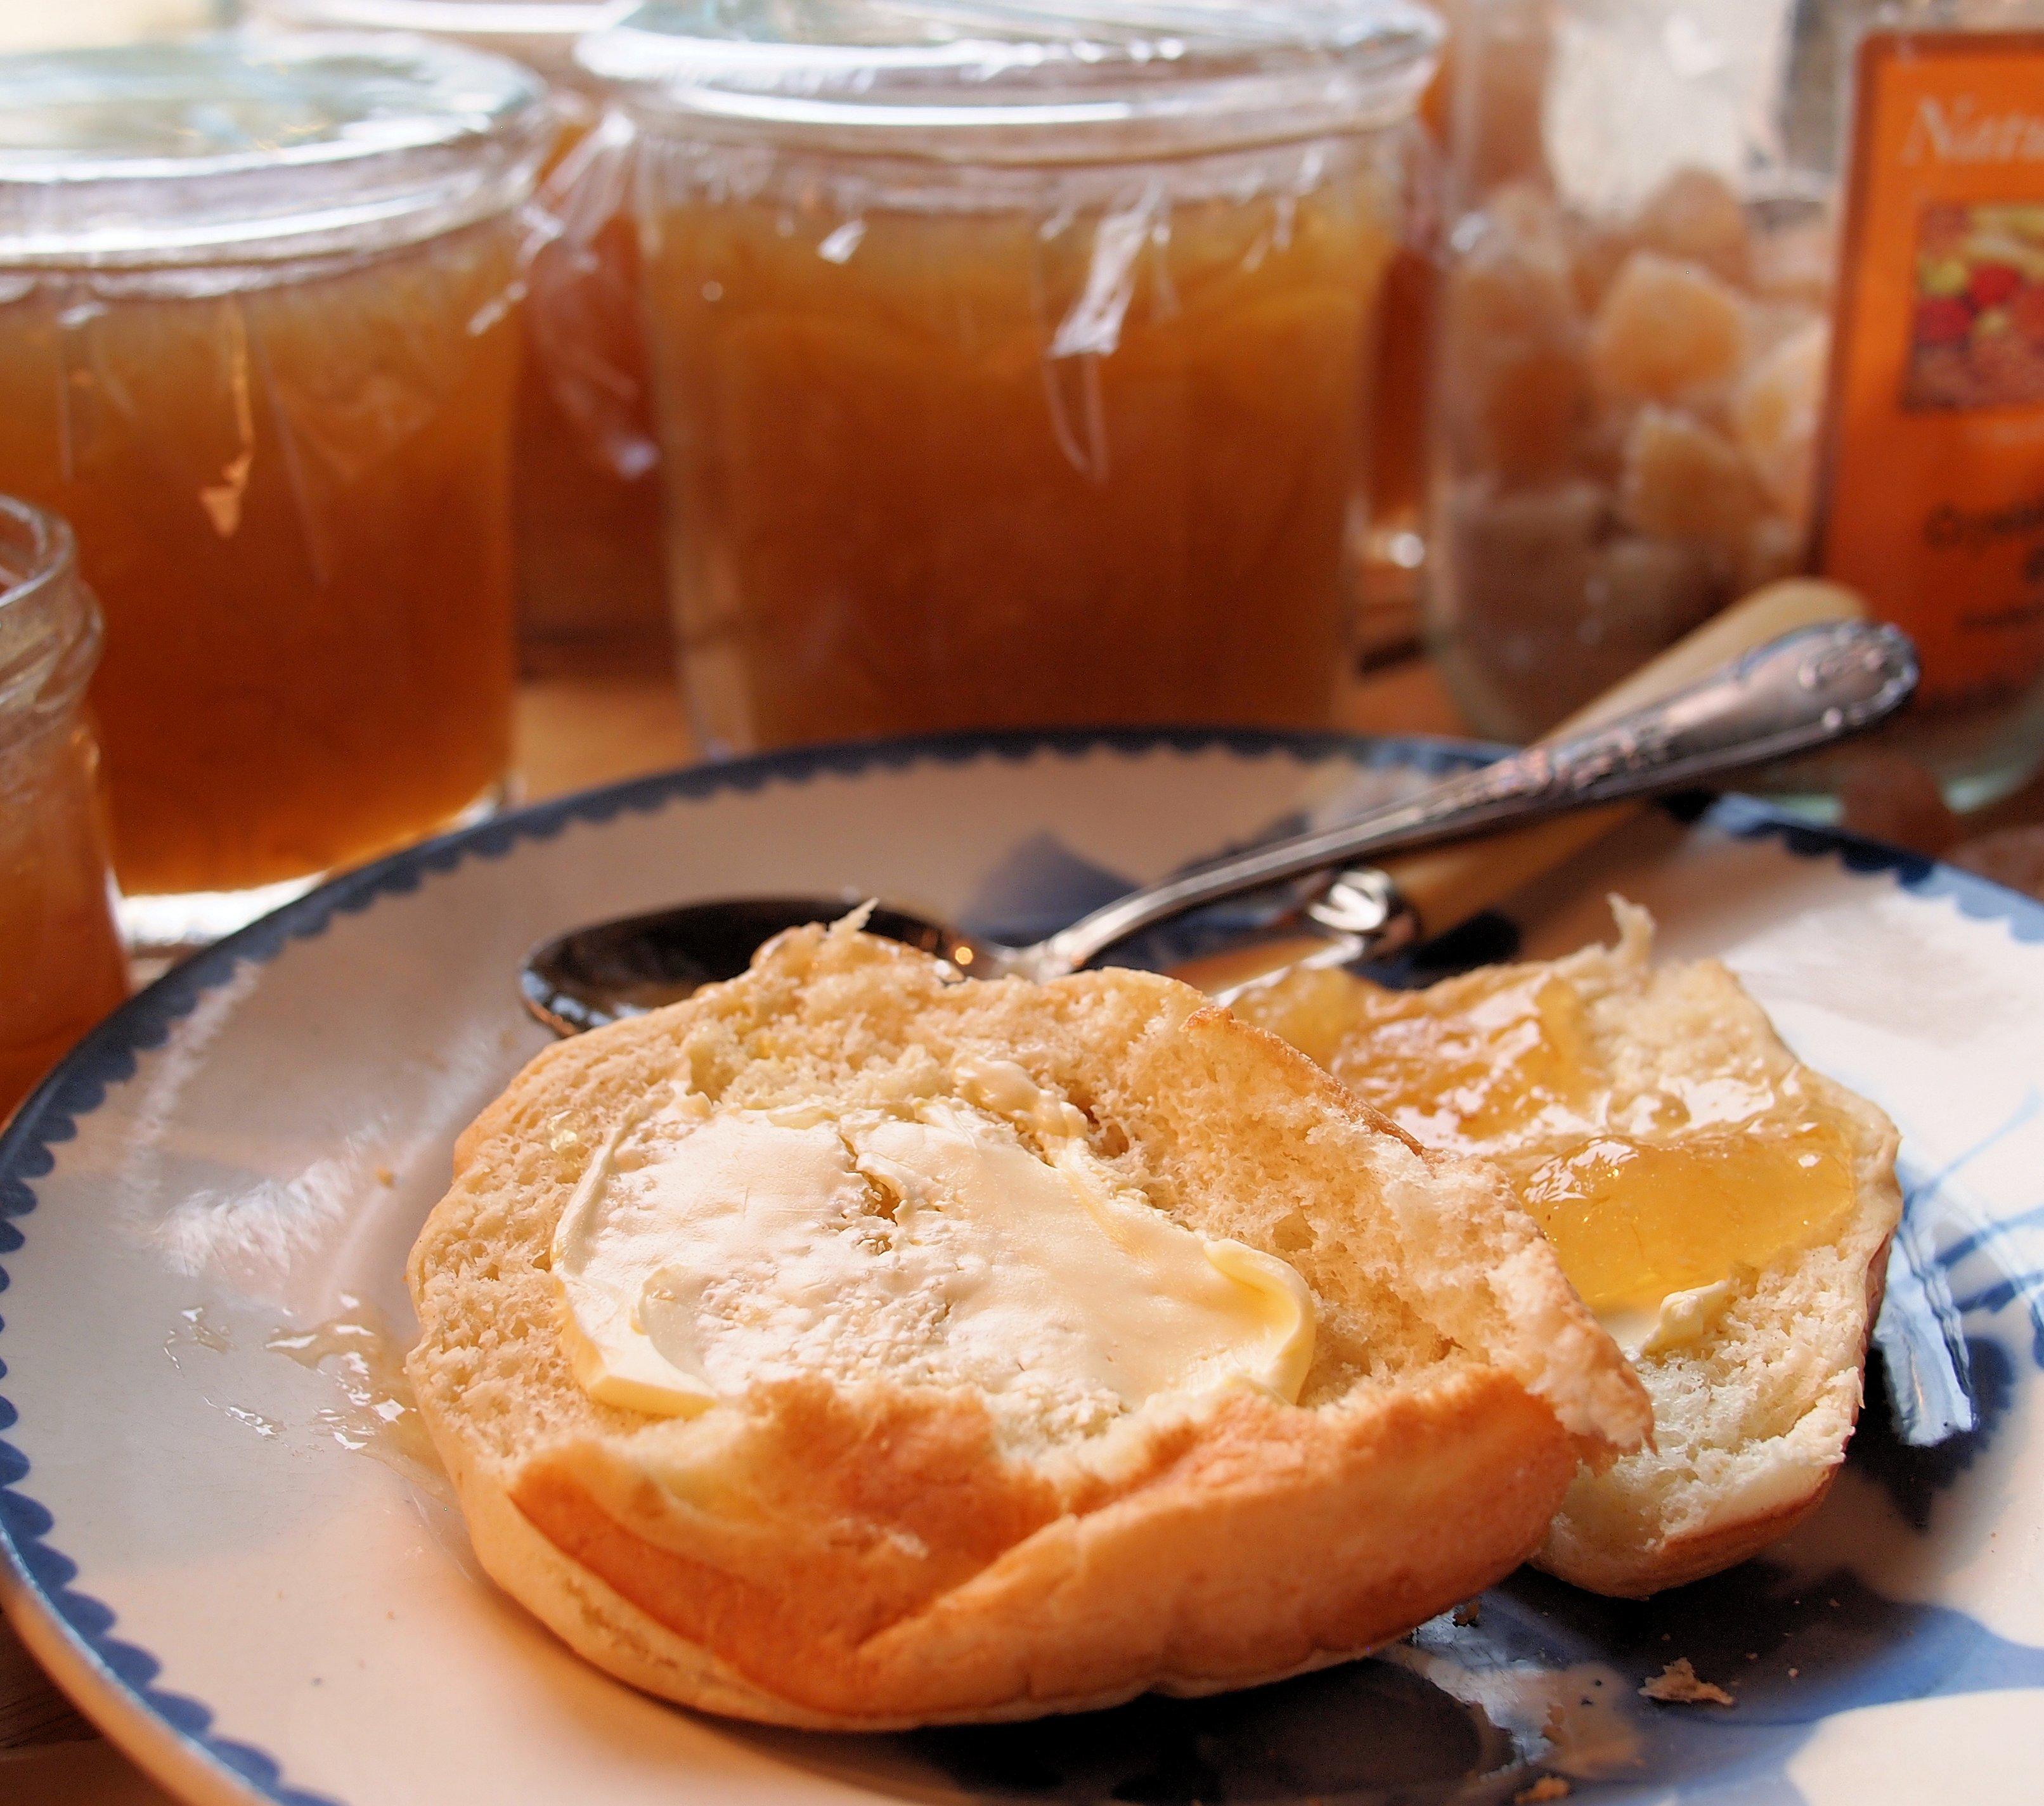 Breakfast Week Meal Plan Baked Full English Breakfast Recipe And